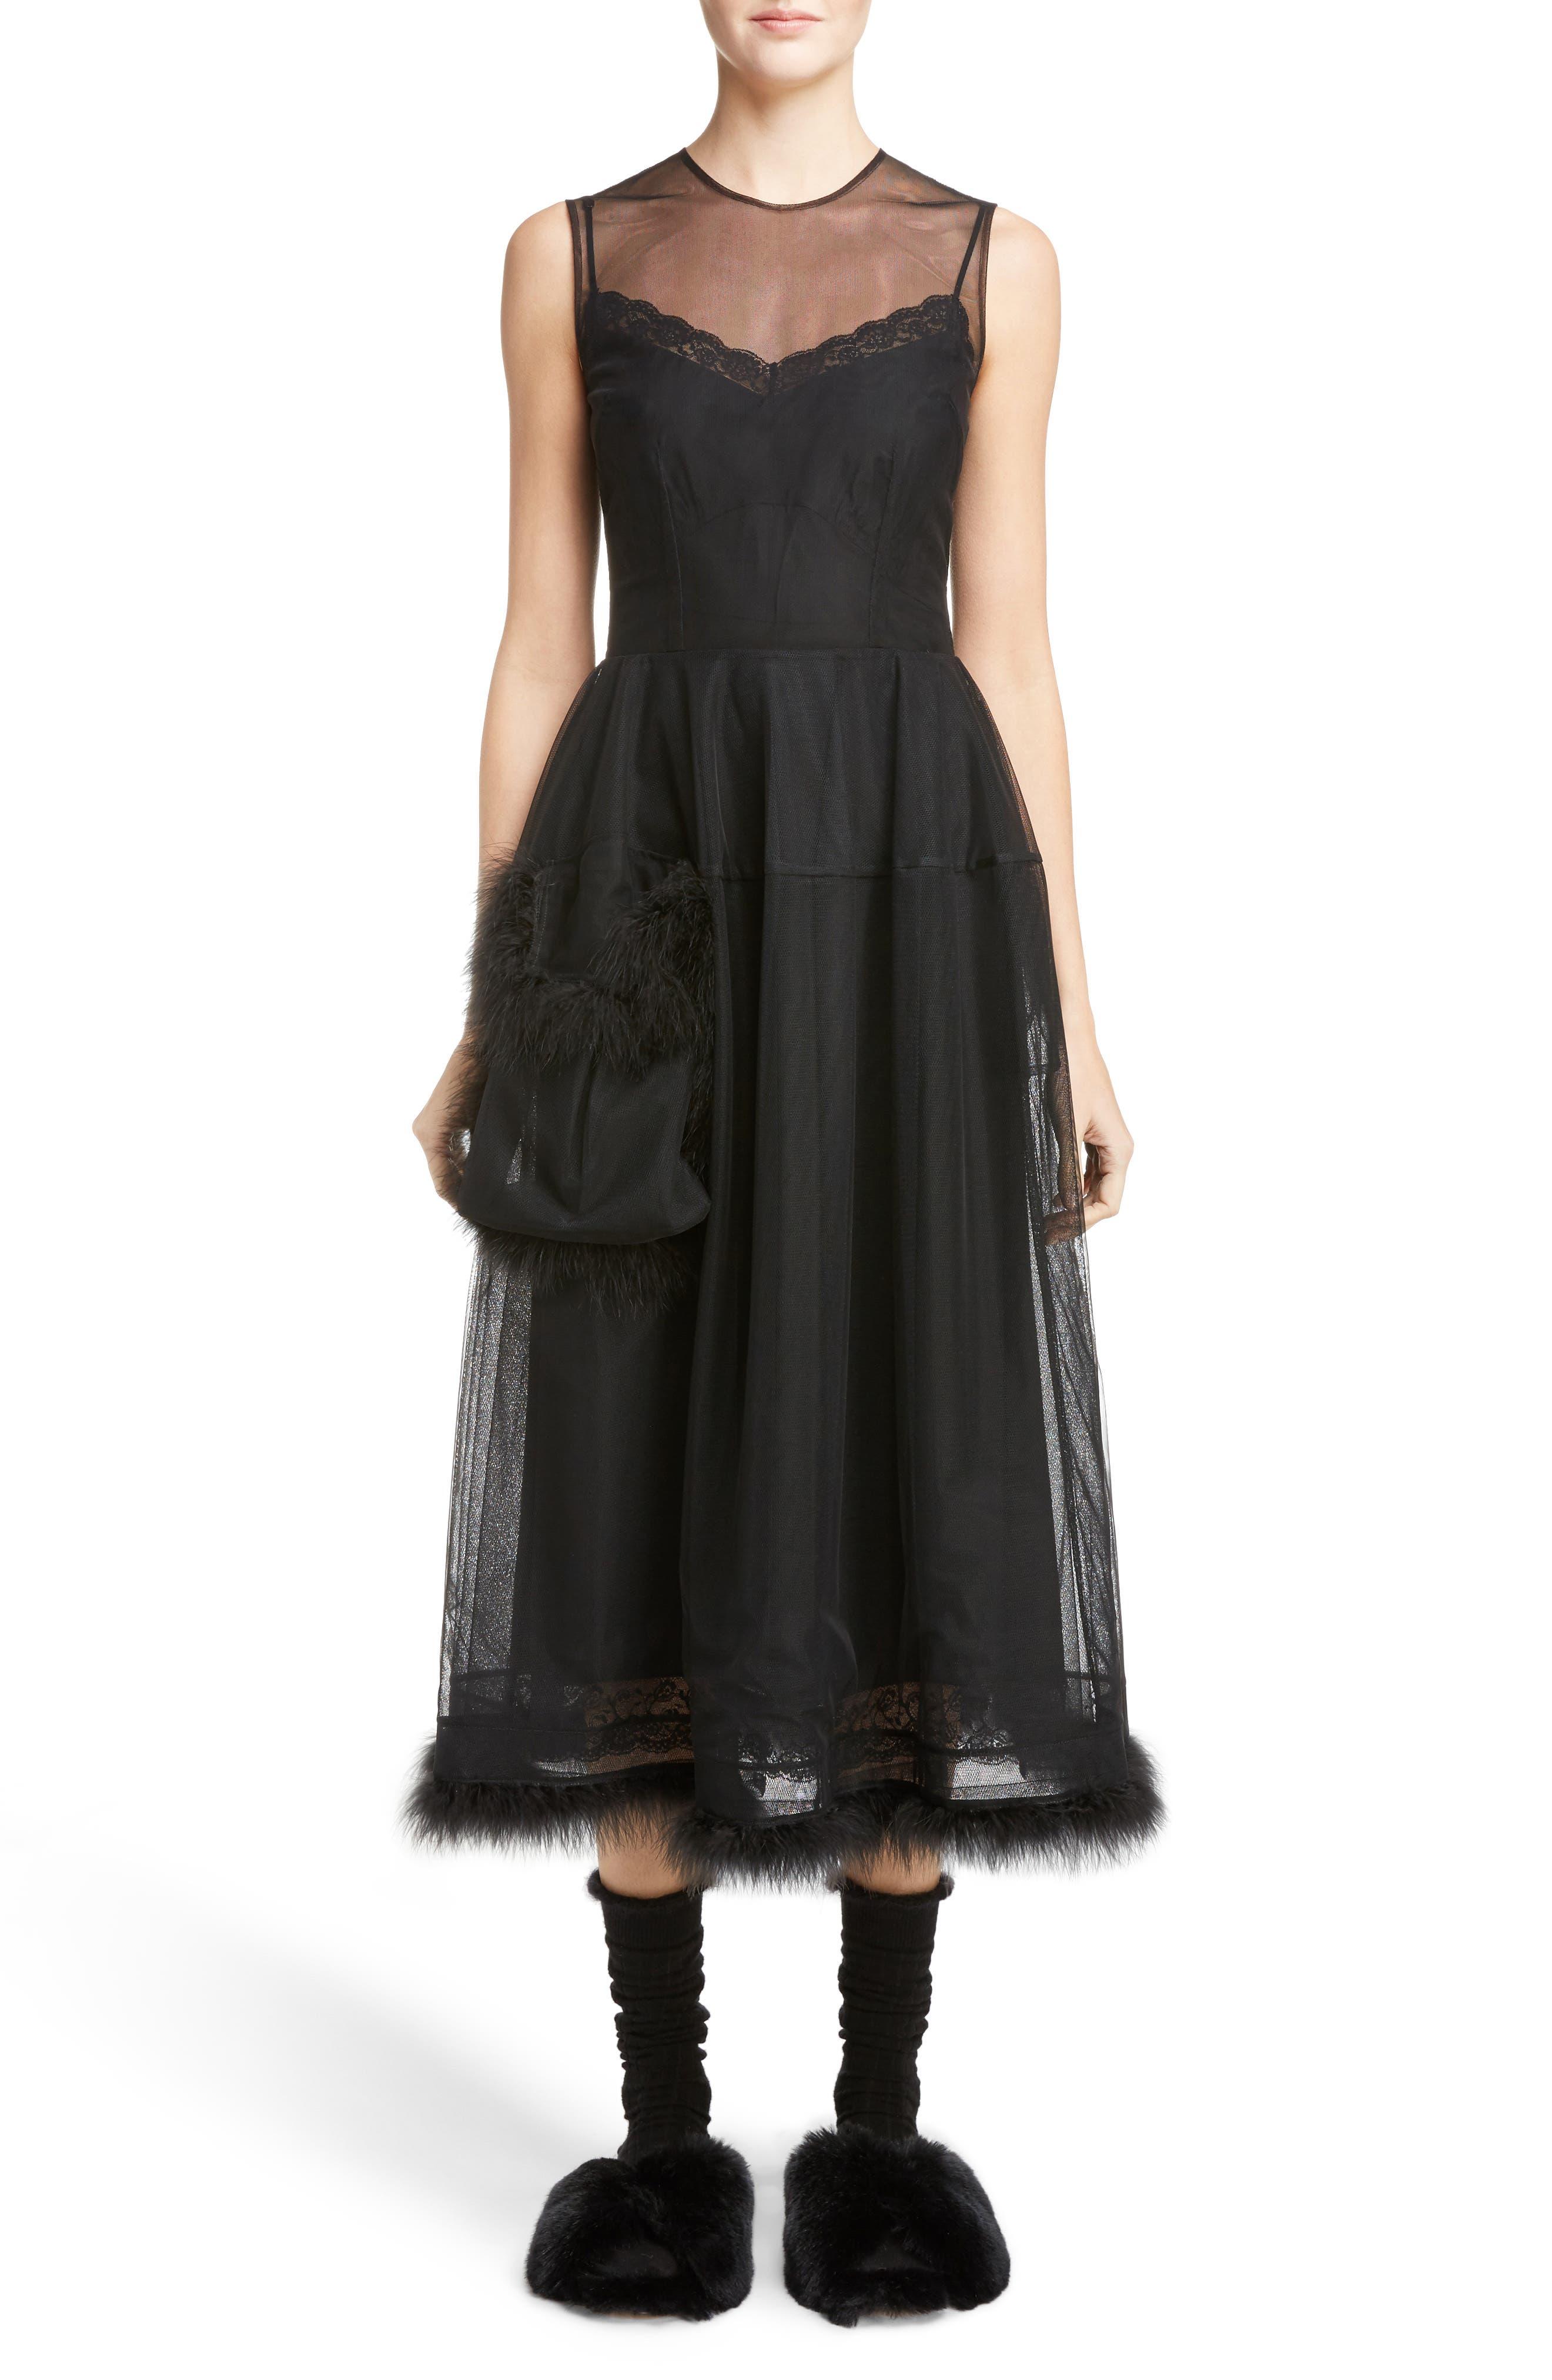 Simone Rocha Teddy Feather Trim Tulle Dress